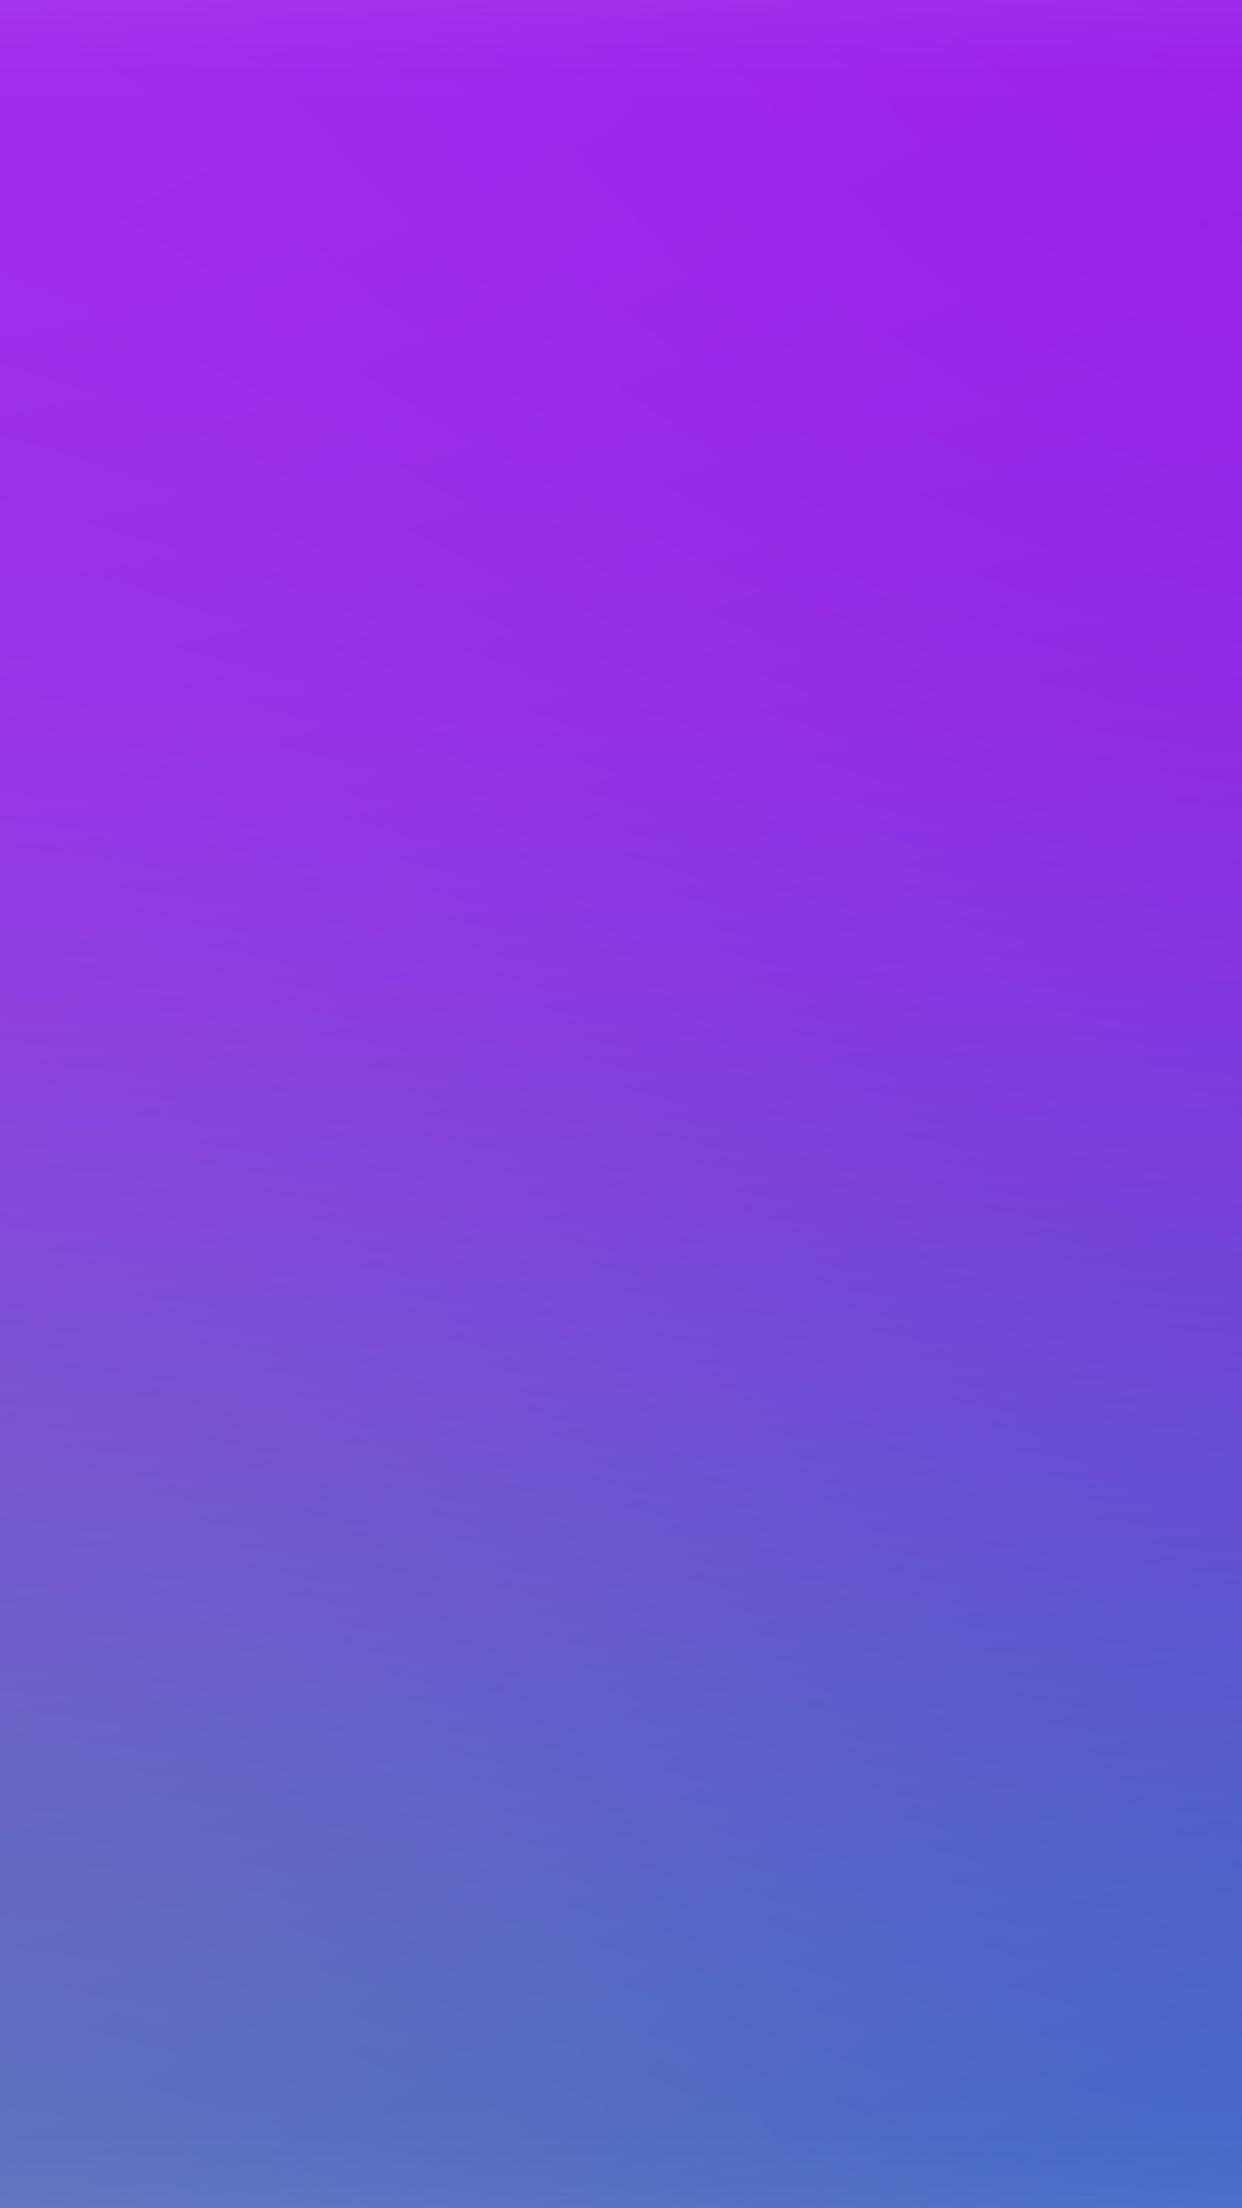 Sm09 Purple Blue Blur Gradation Wallpaper